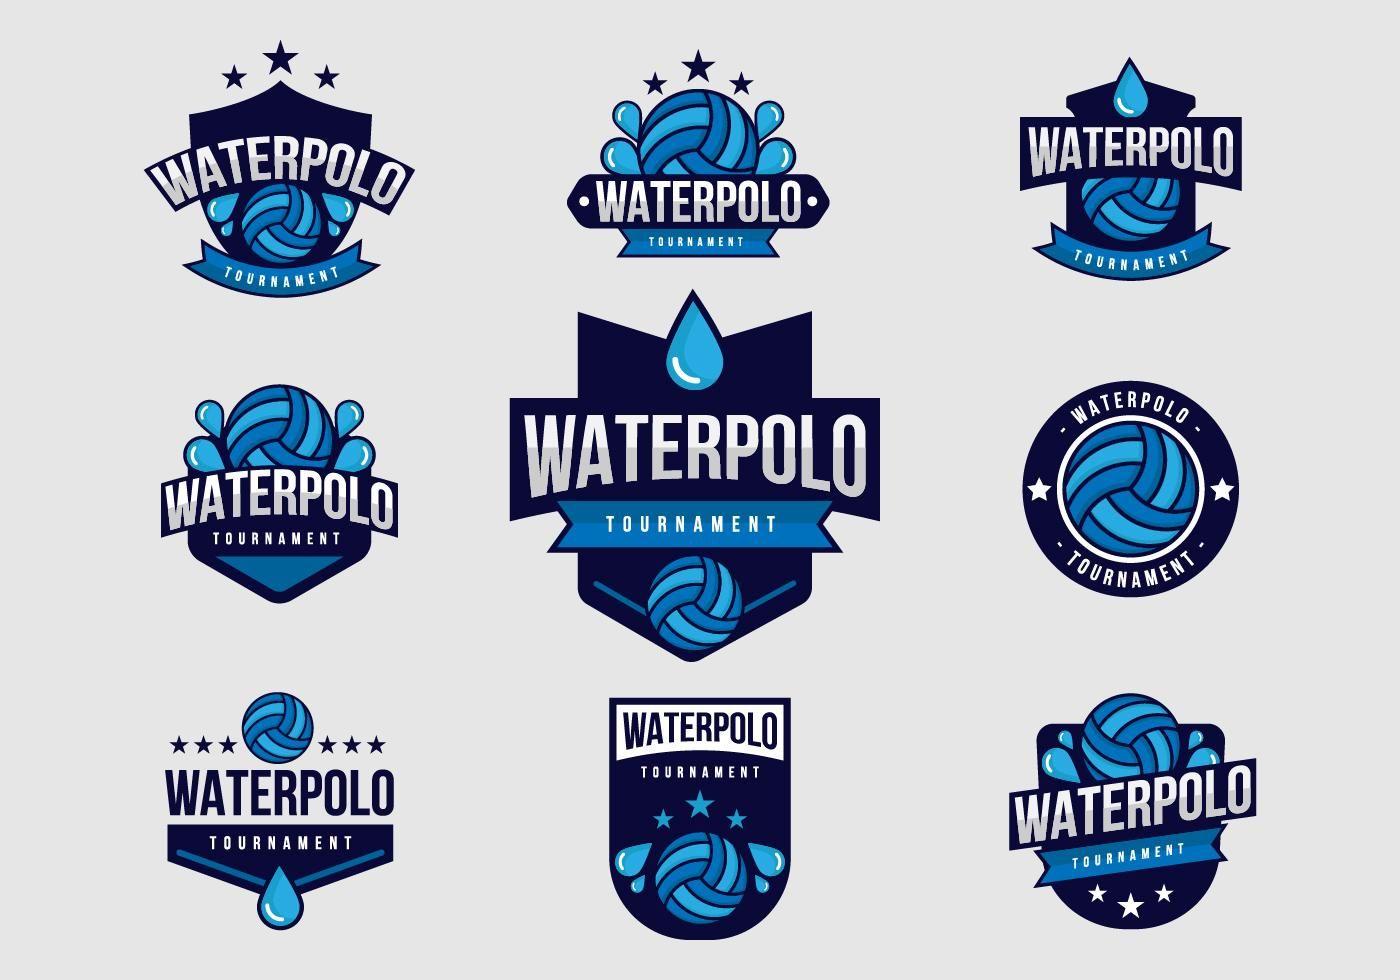 Free Water Polo Badges Vector โปโลน้ำ, ป้ายโฆษณา, พื้นหลัง